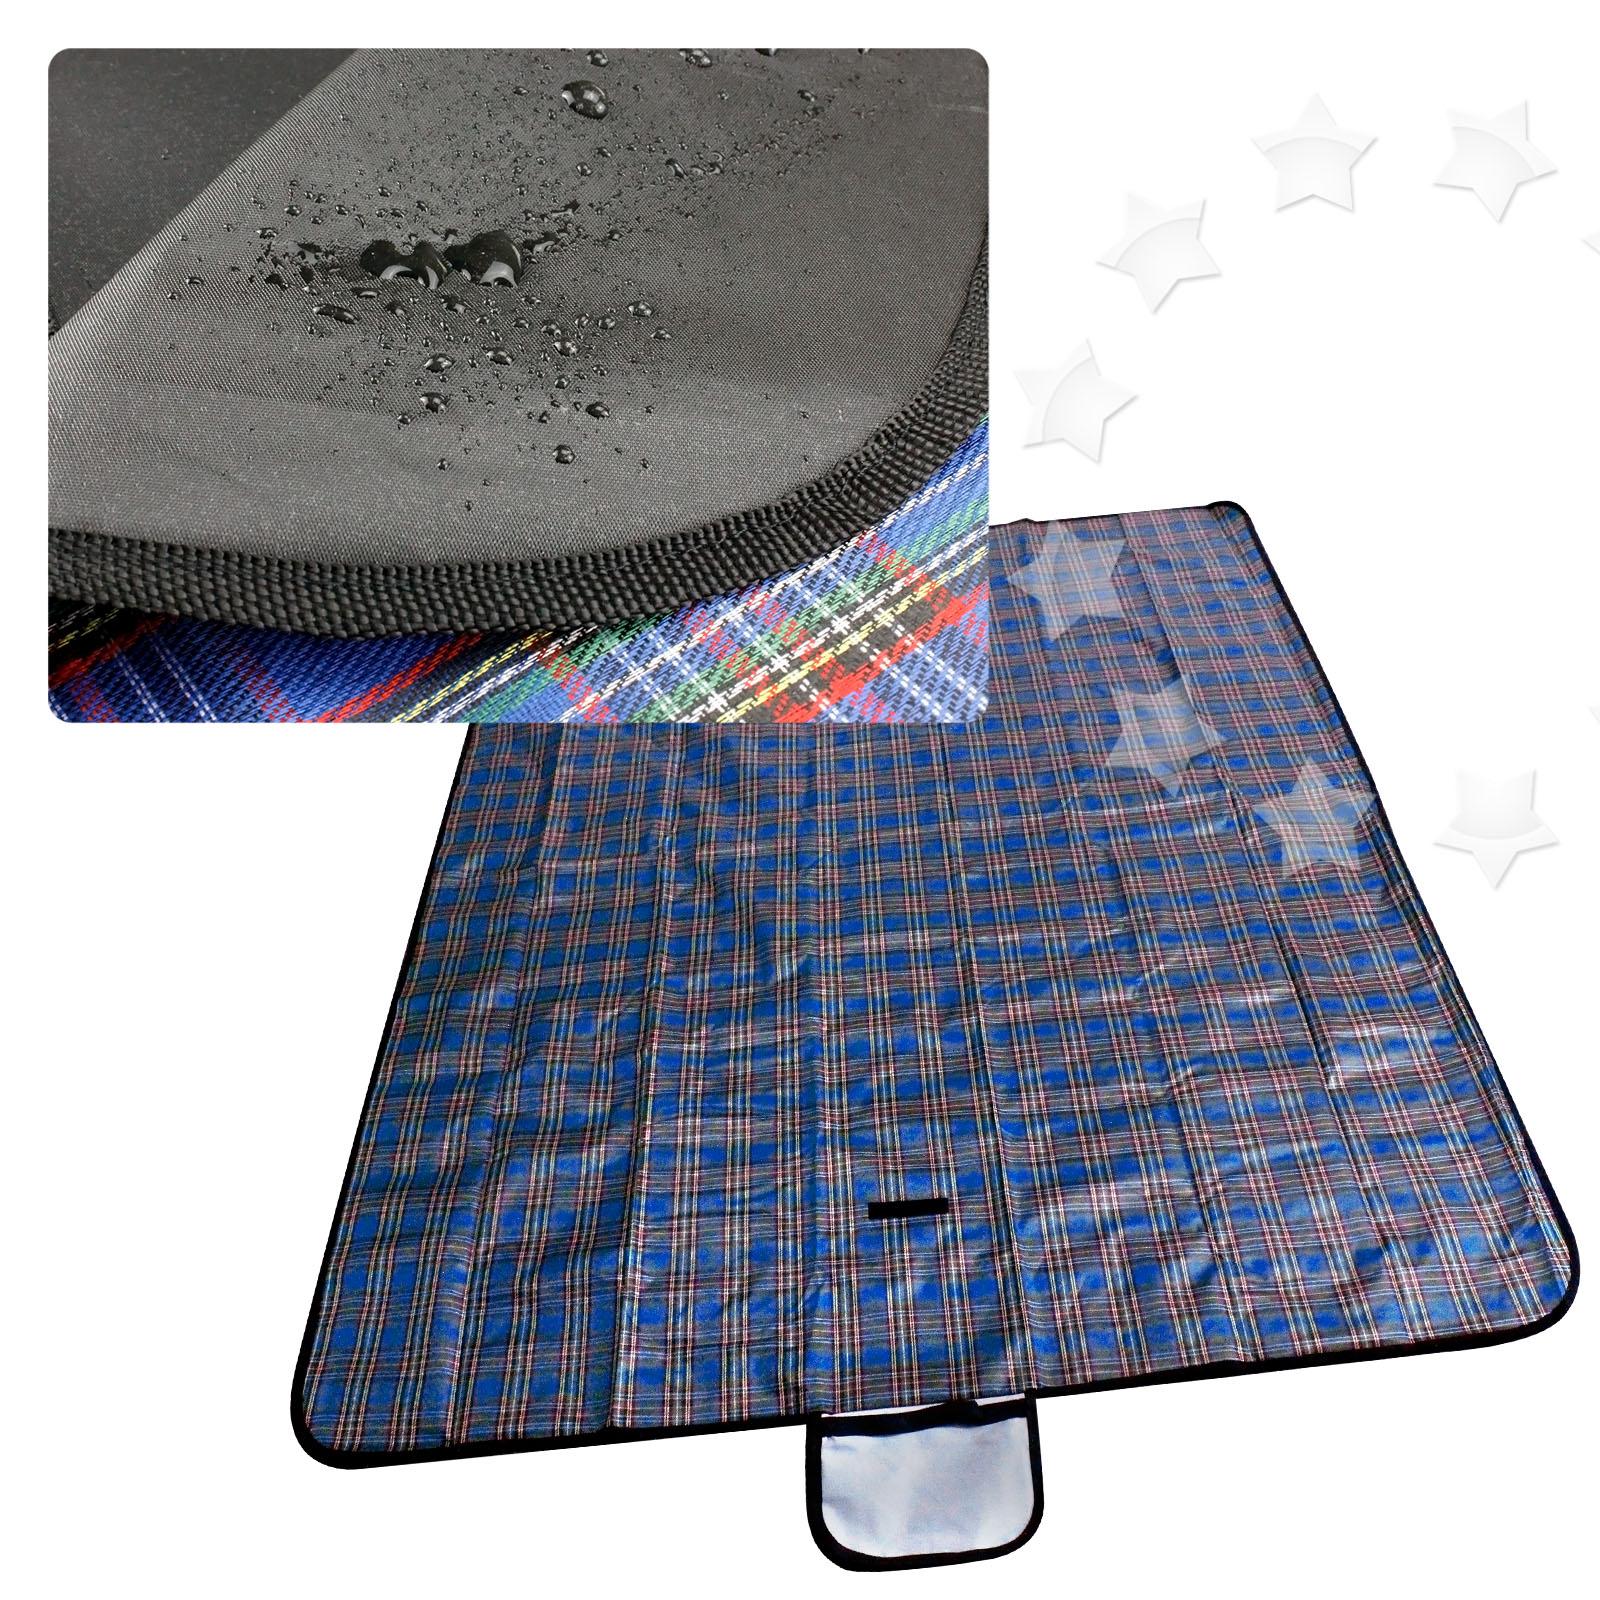 "Picnic Blanket: X Large 57x79"" Picnic Blanket Beach Mat Camping Travel Rug"